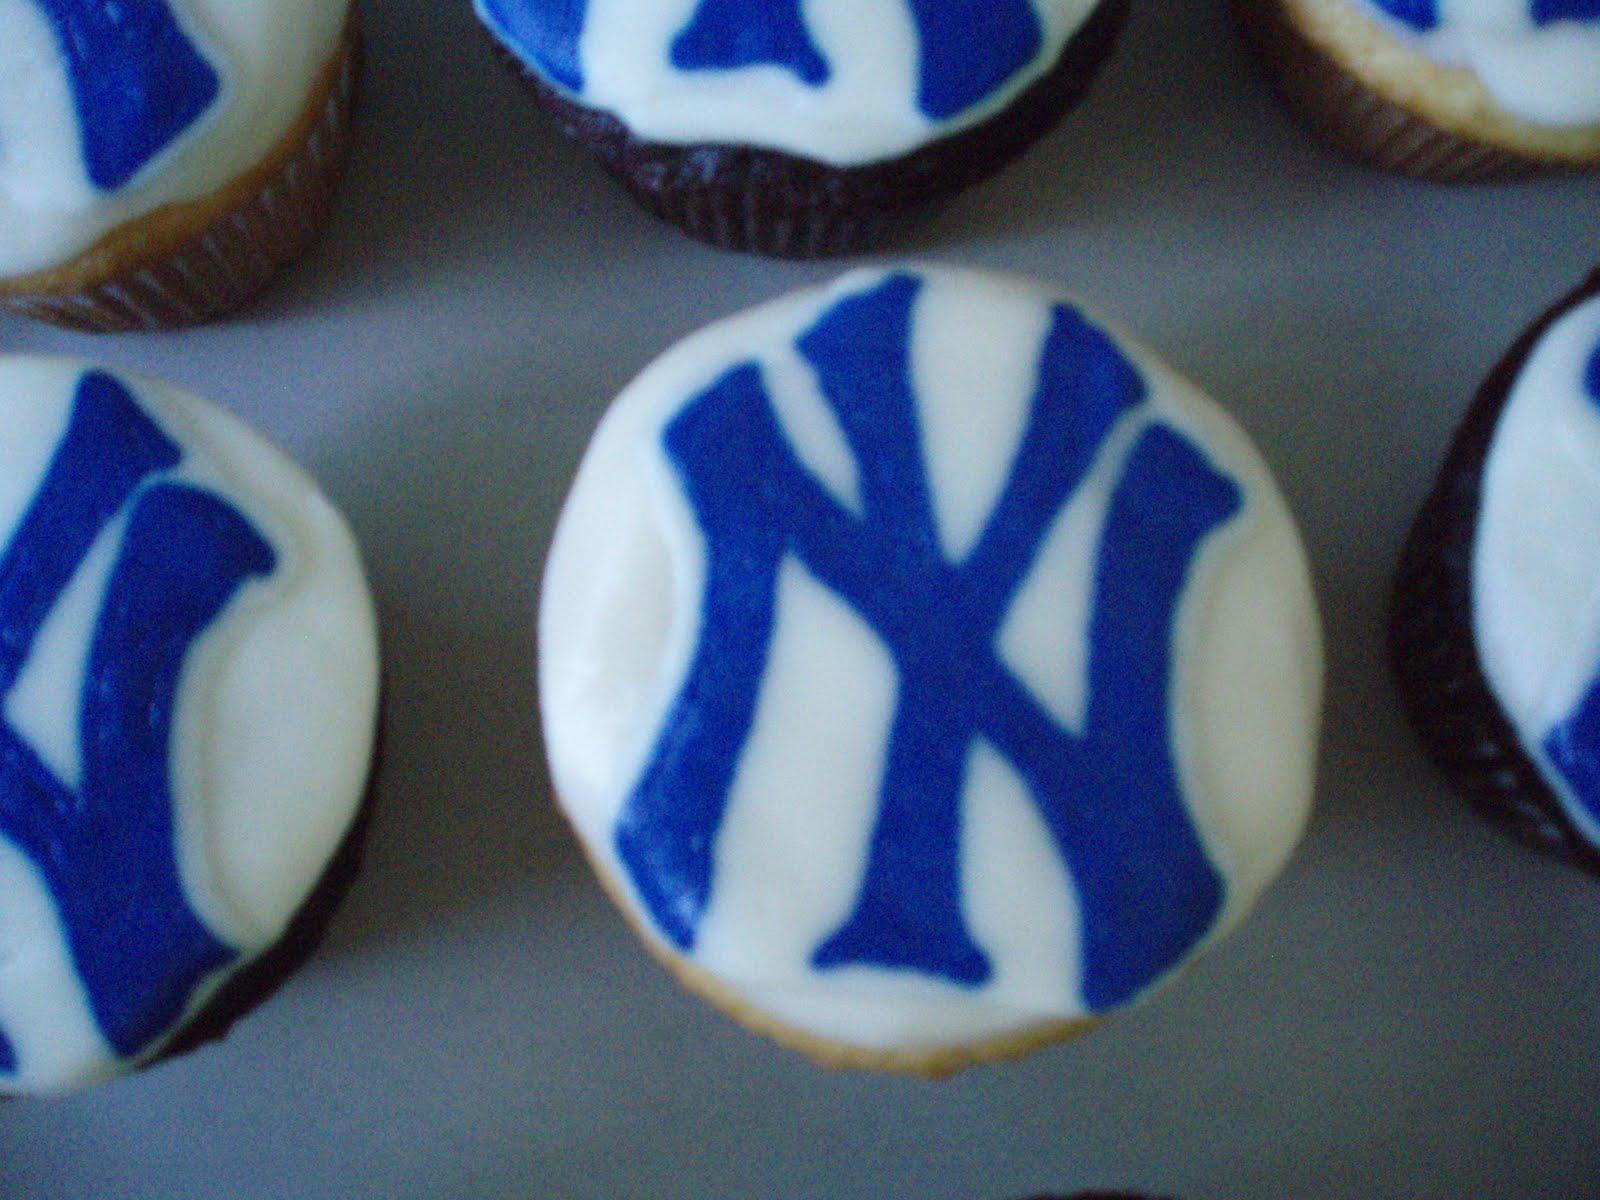 http://1.bp.blogspot.com/_SQwUmrGZ13Y/TAnCCOPtK5I/AAAAAAAAATc/WWGgzNJle4g/s1600/yankee+cupcake.JPG